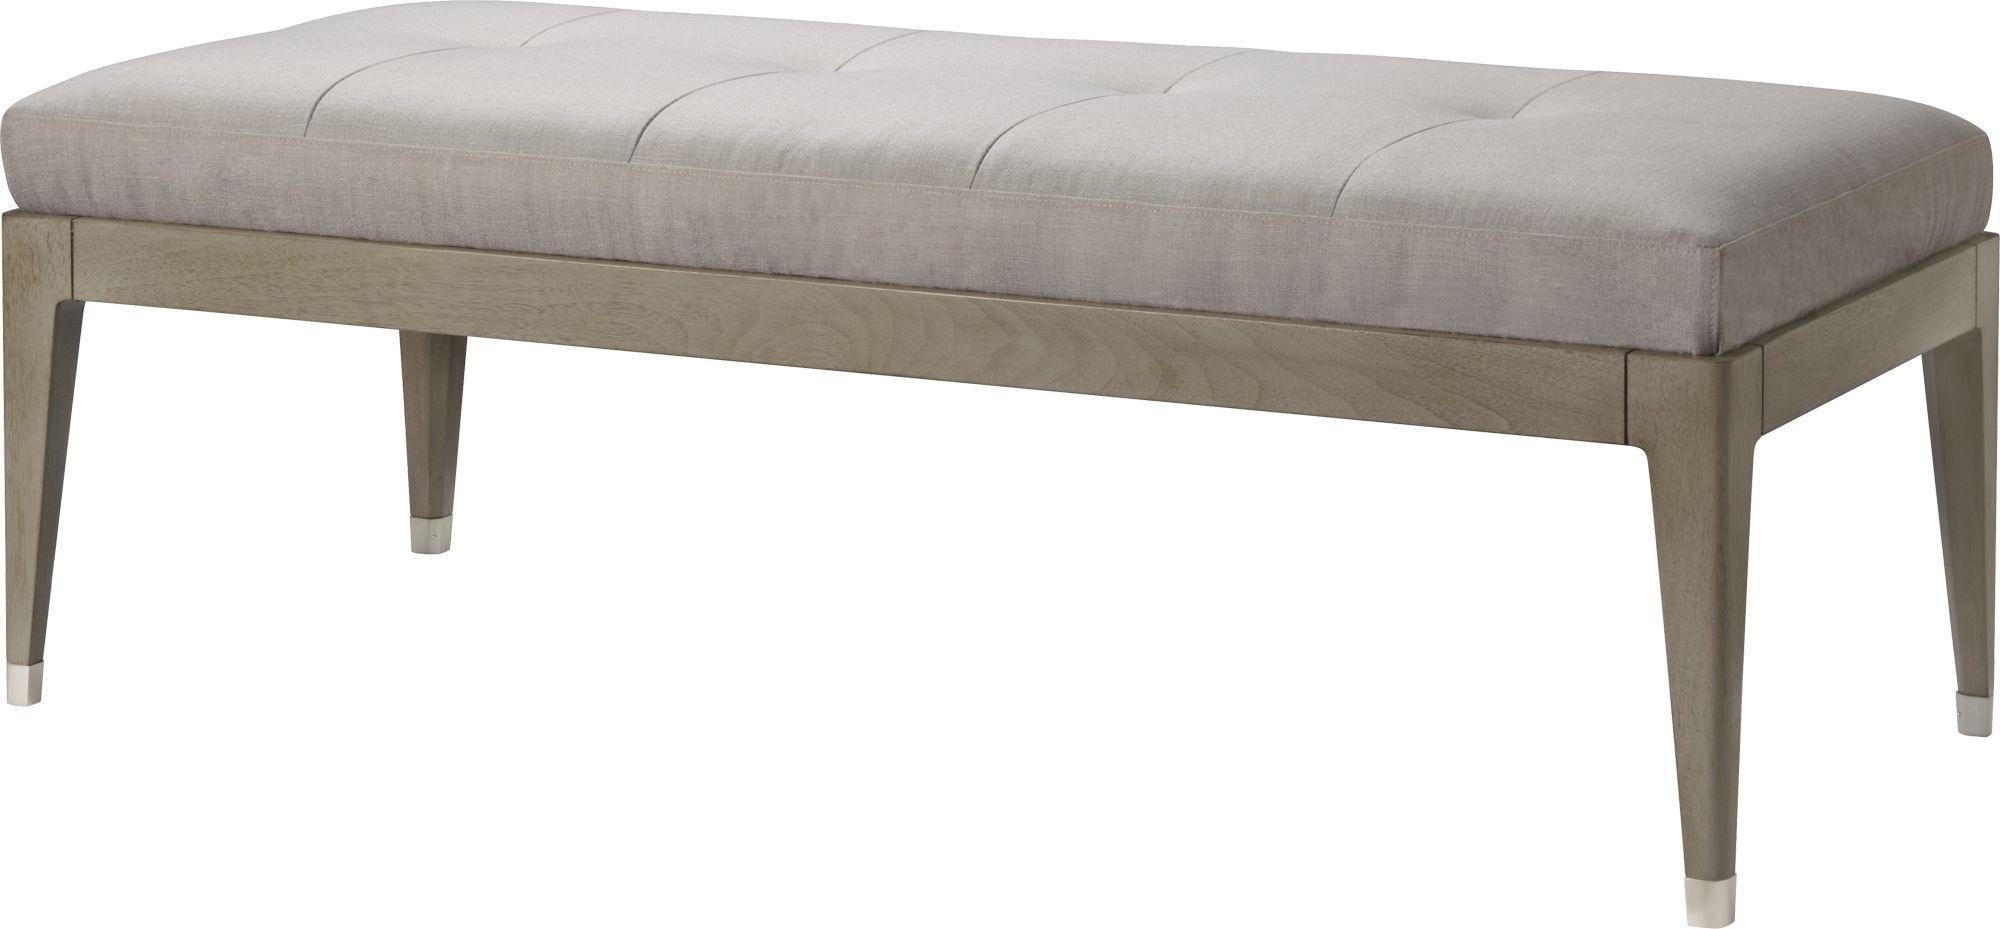 Baker Furniture Barbara Barry Modern Moment Bench 3616